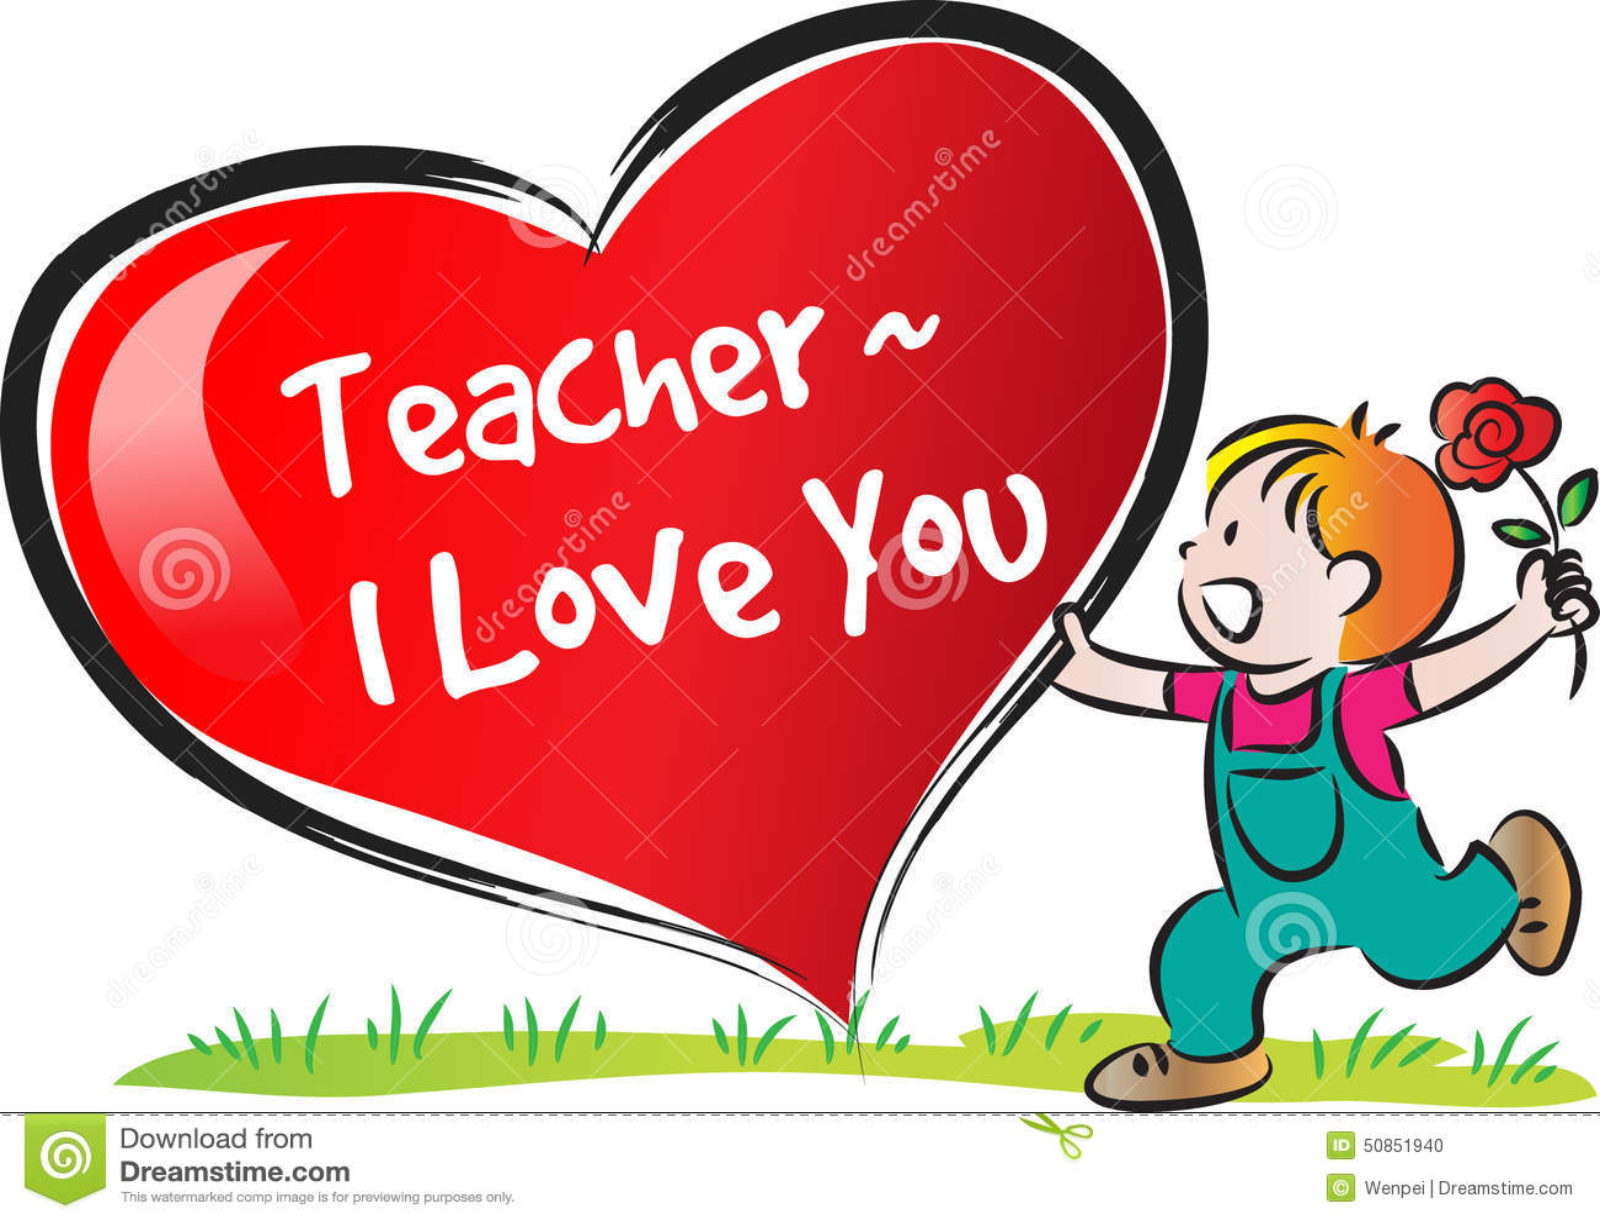 Teachers Day Greeting Card Download Panicconsumer